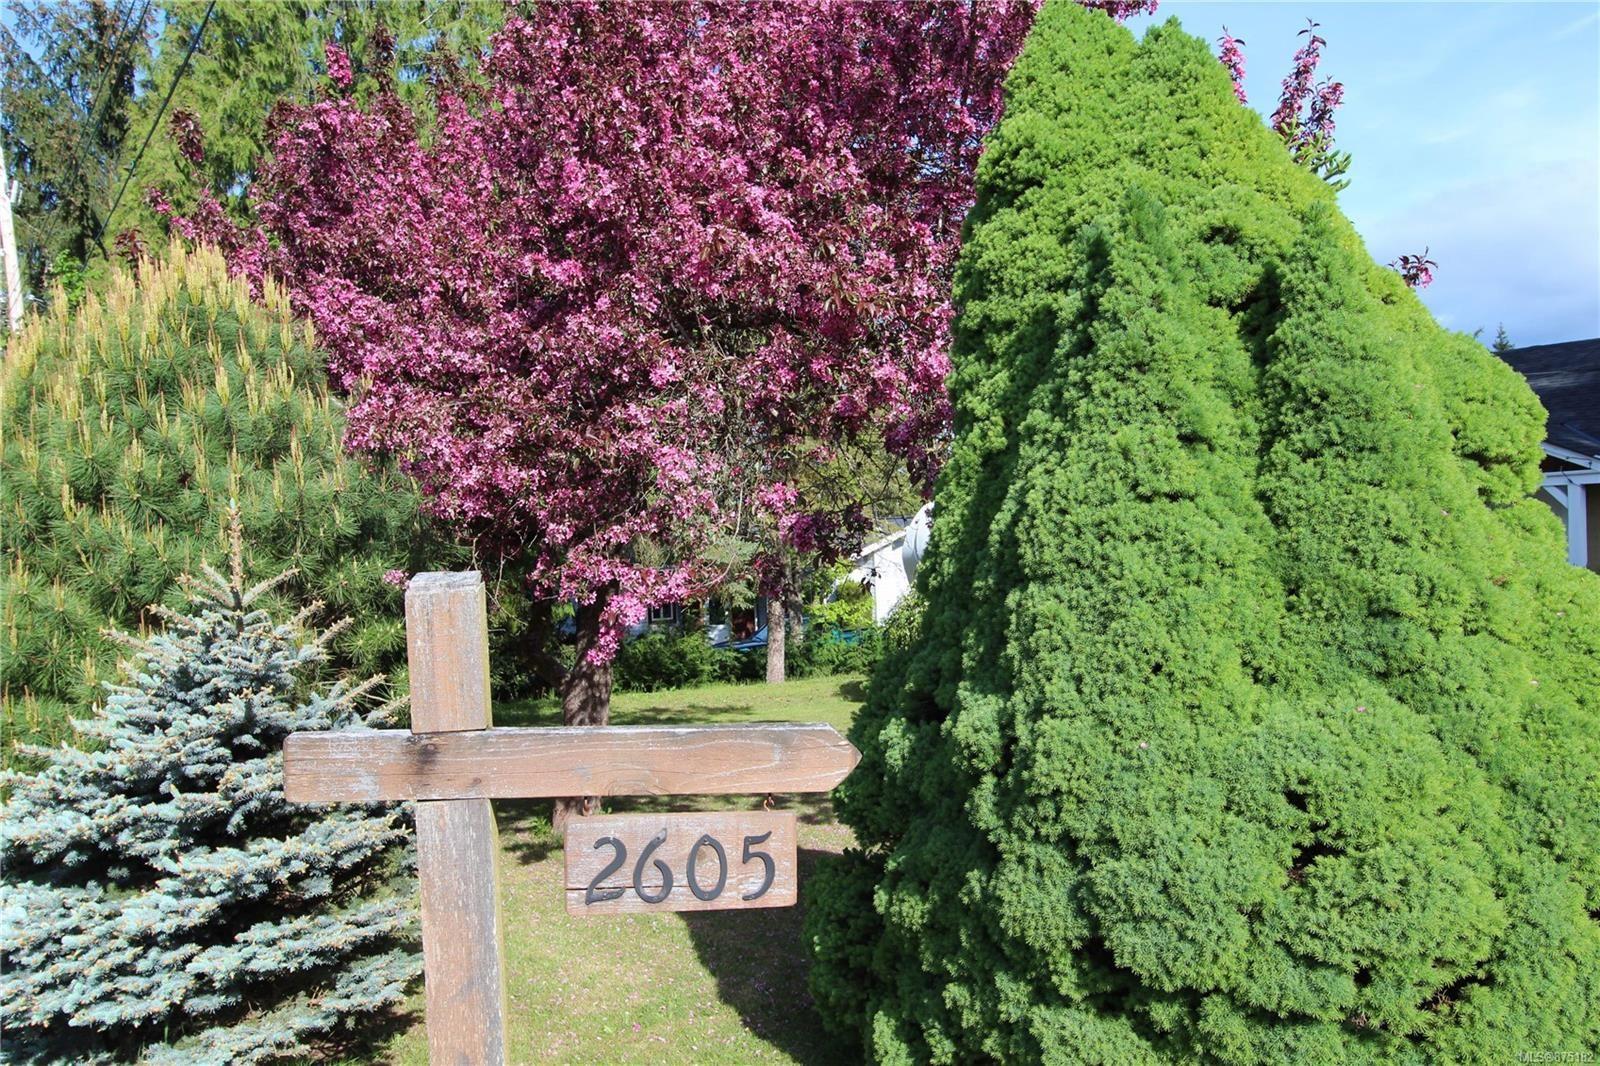 Main Photo: 2605 Bruce Rd in : Du Cowichan Station/Glenora House for sale (Duncan)  : MLS®# 875182